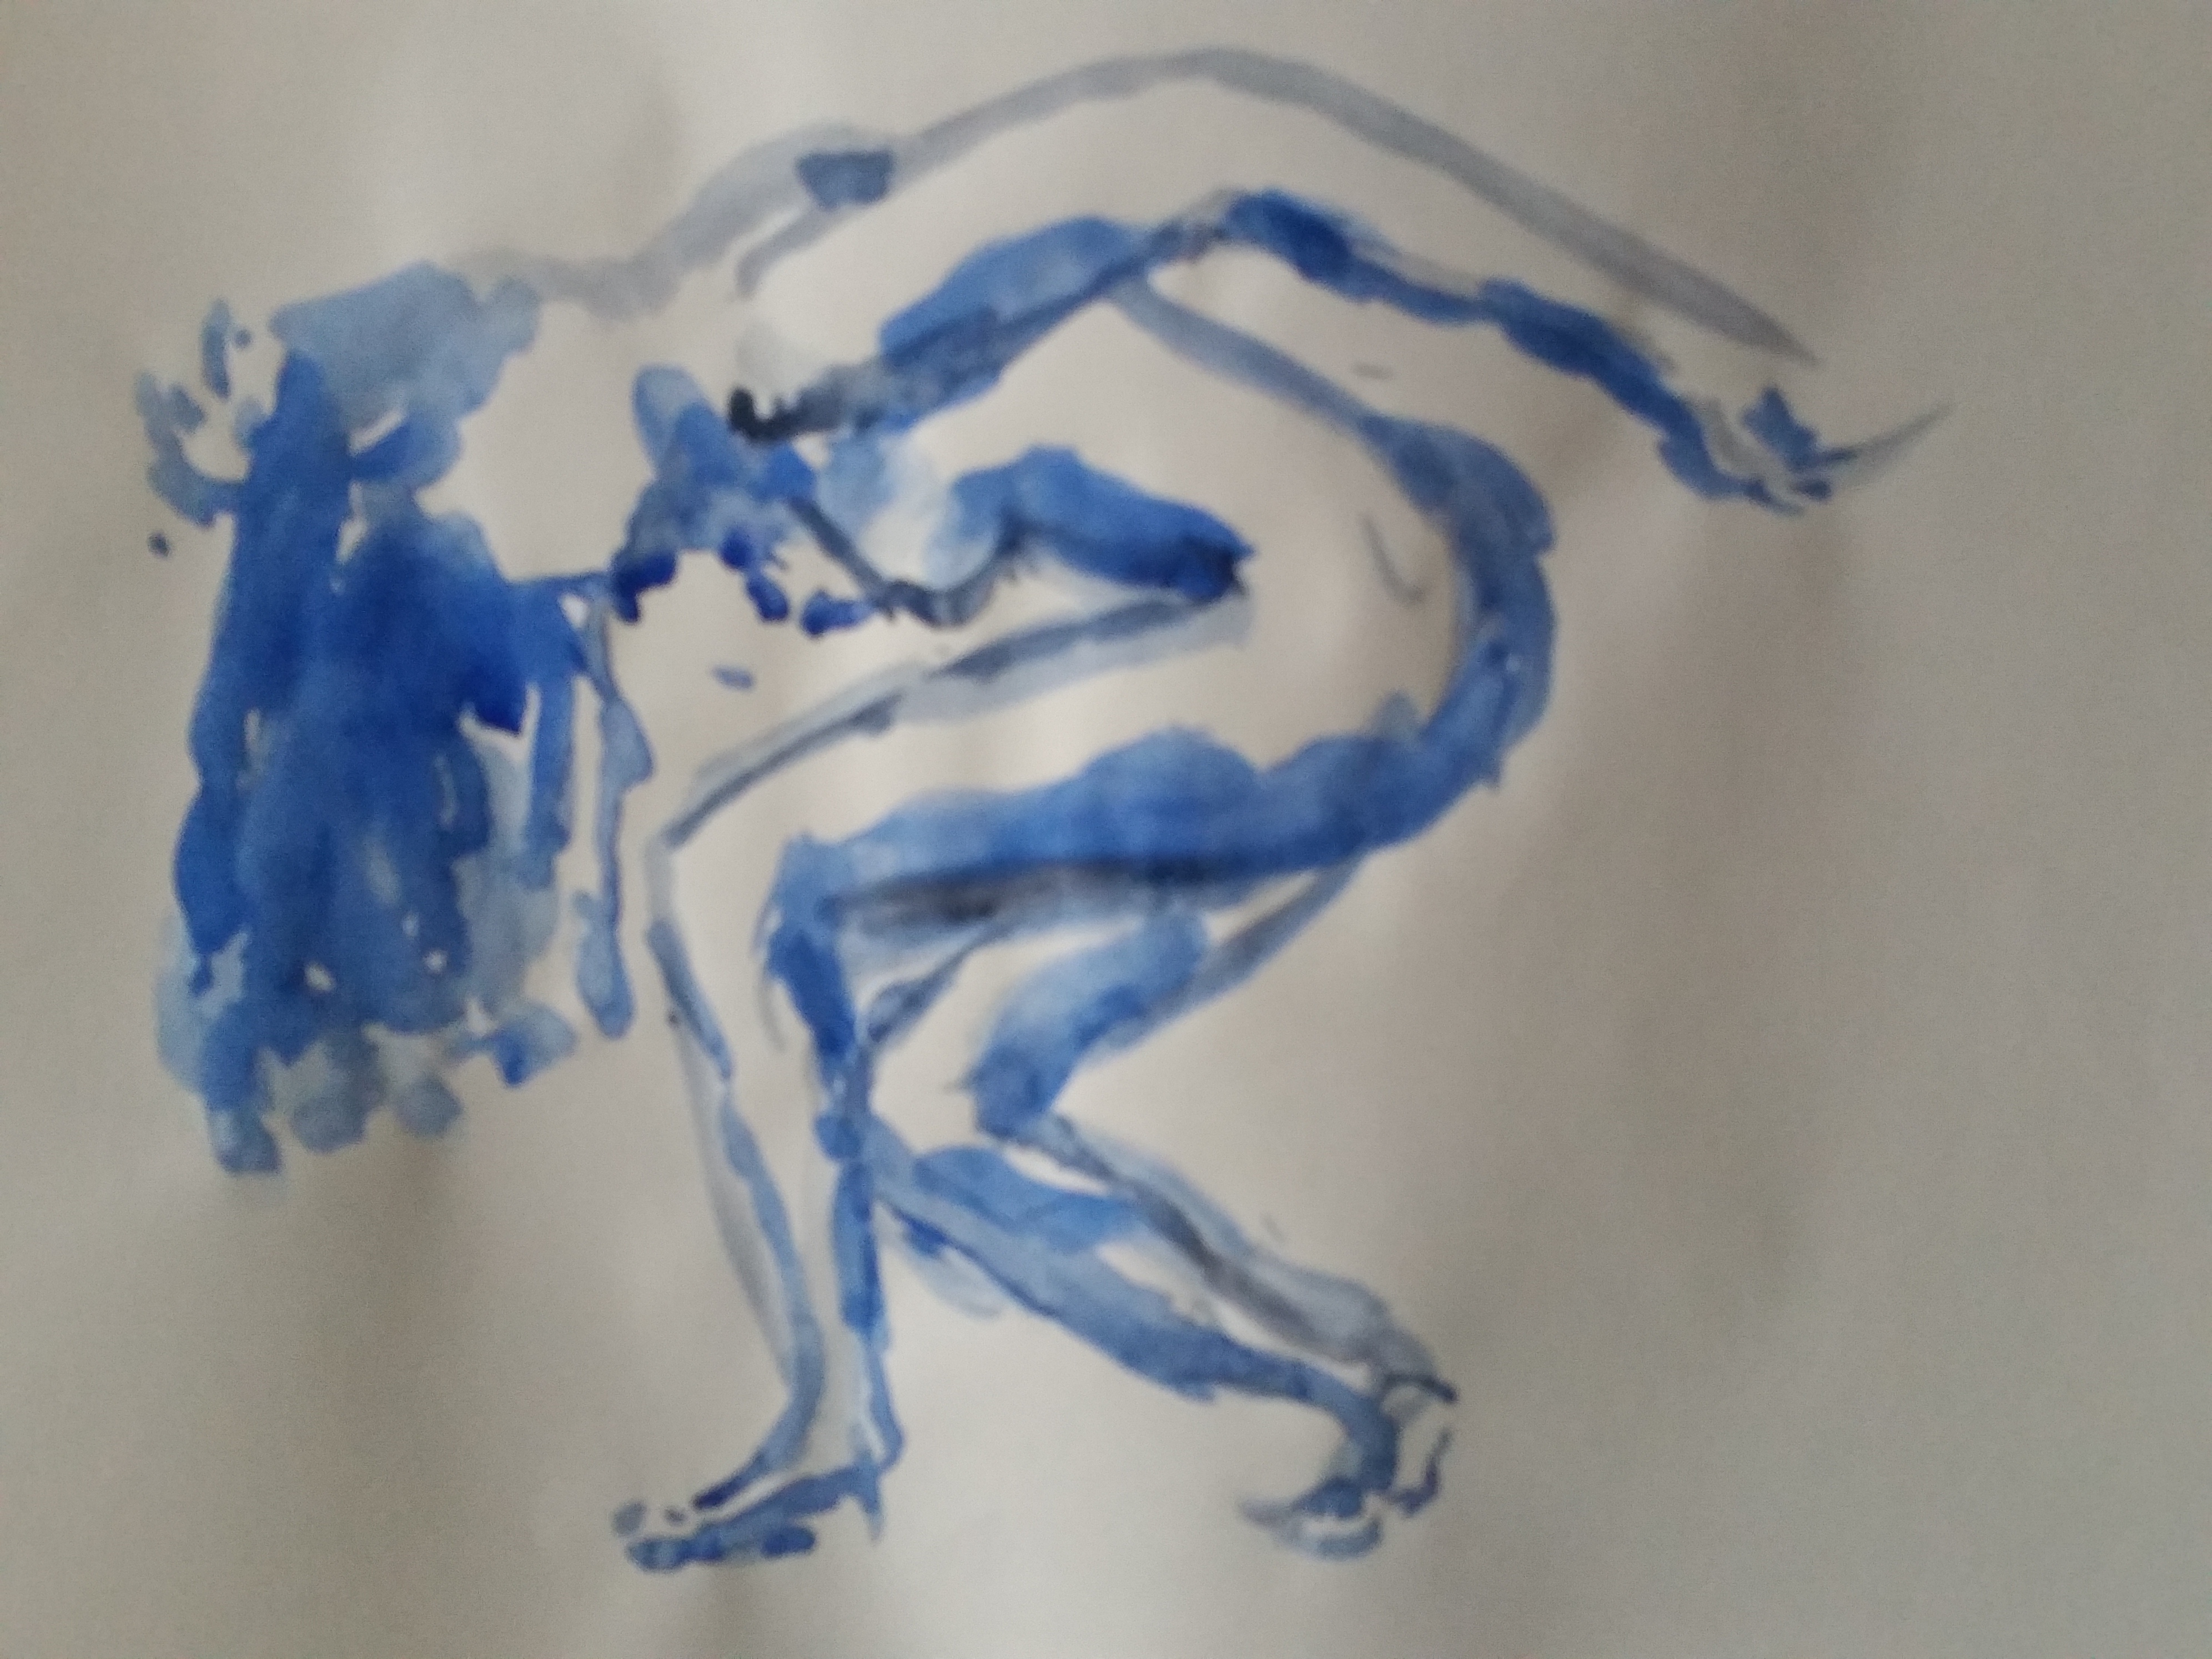 Dessin bleu aquarelle femme  cours de dessin